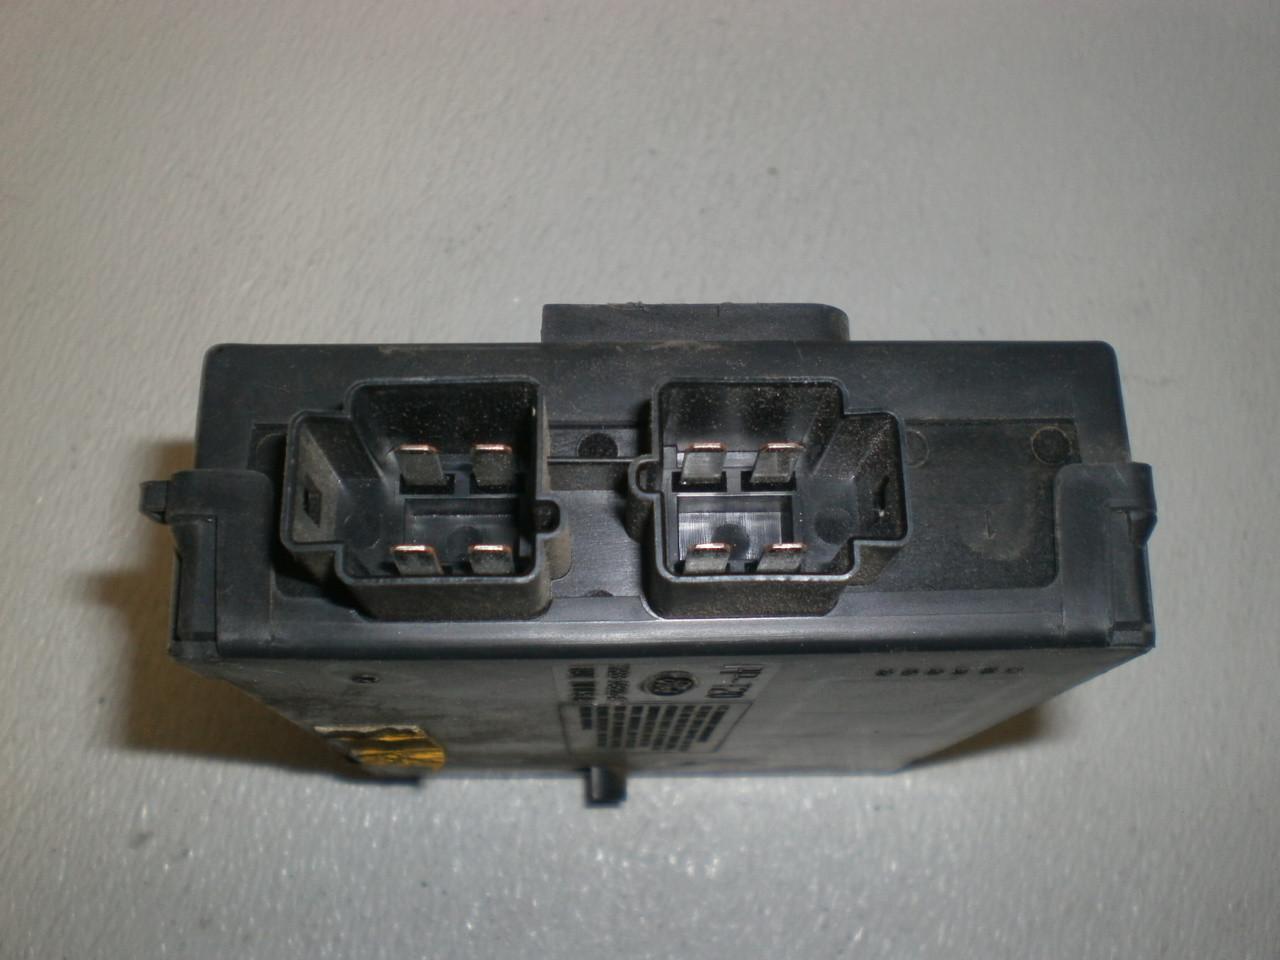 1999-2004 Ford Mustang Gem Module Multi-function Window XR33-14B205-AG AE